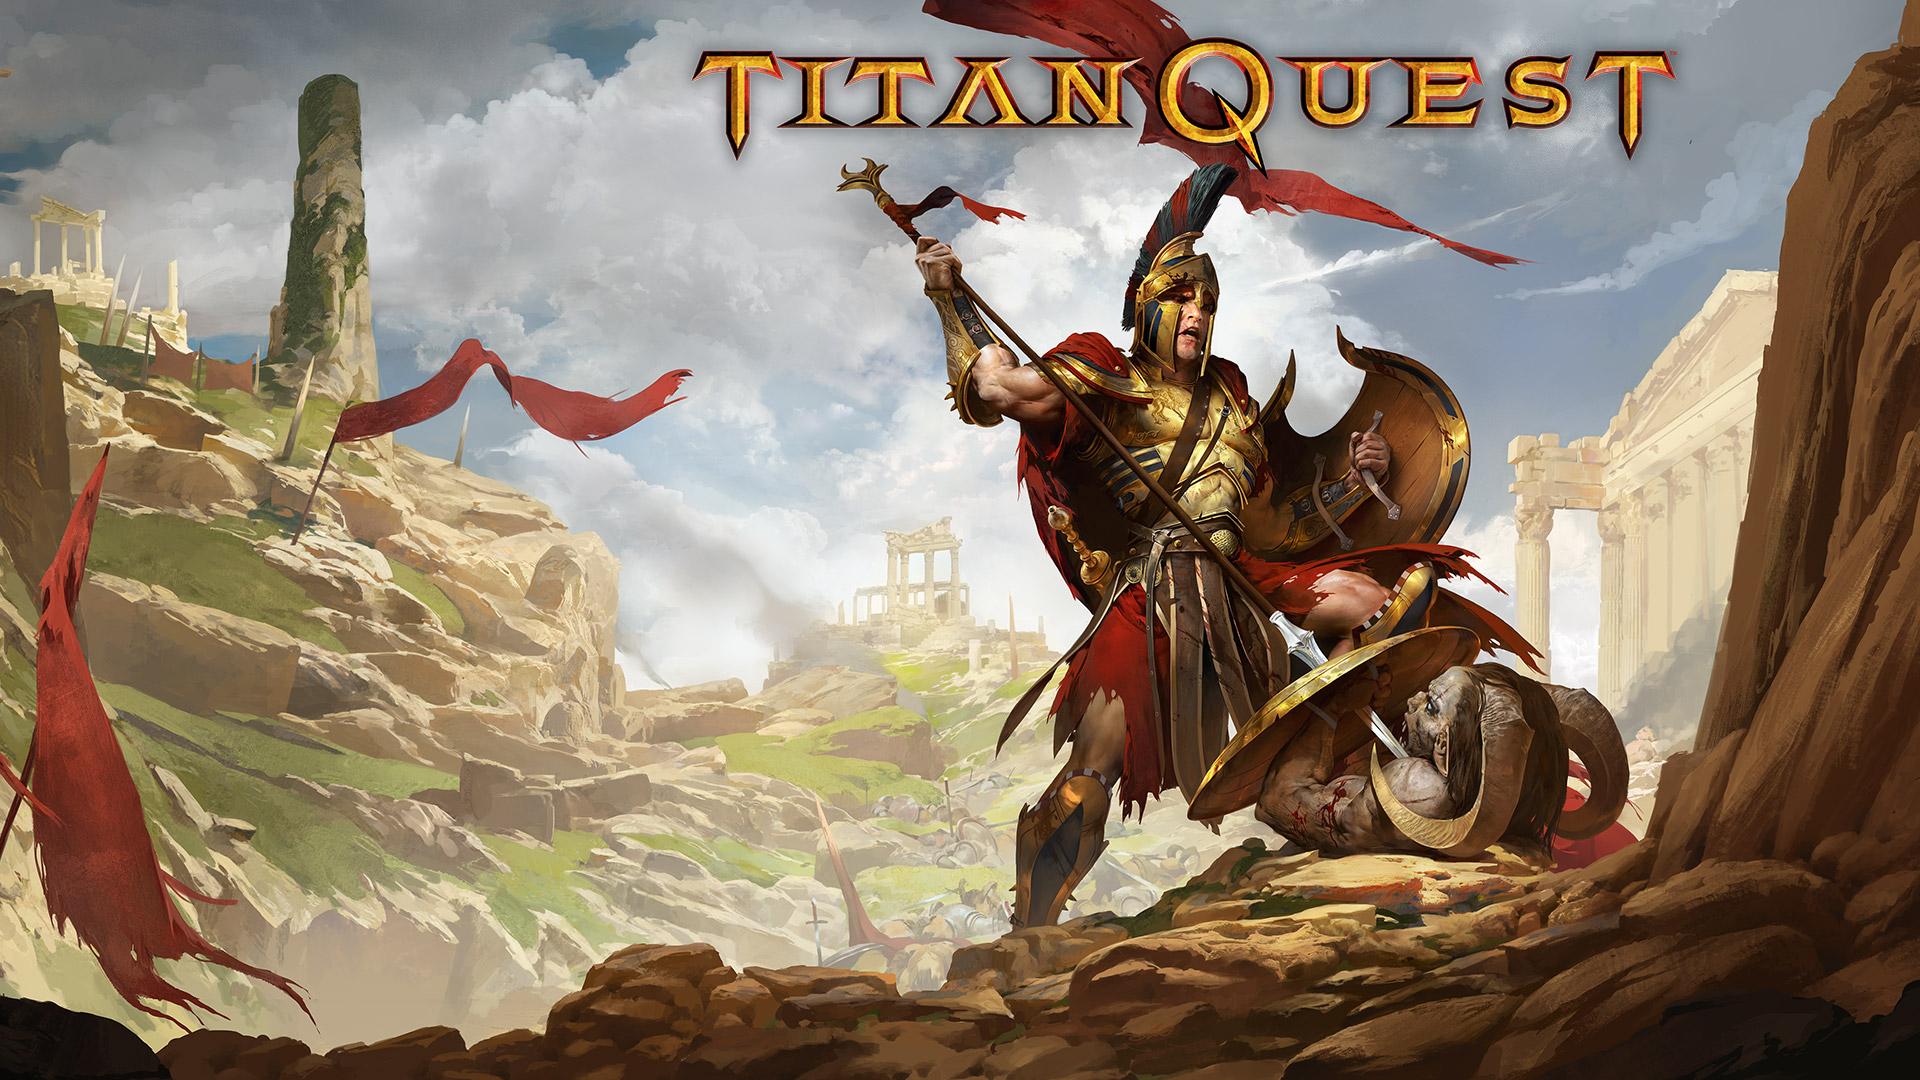 Titan Quest Wallpaper in 1920x1080